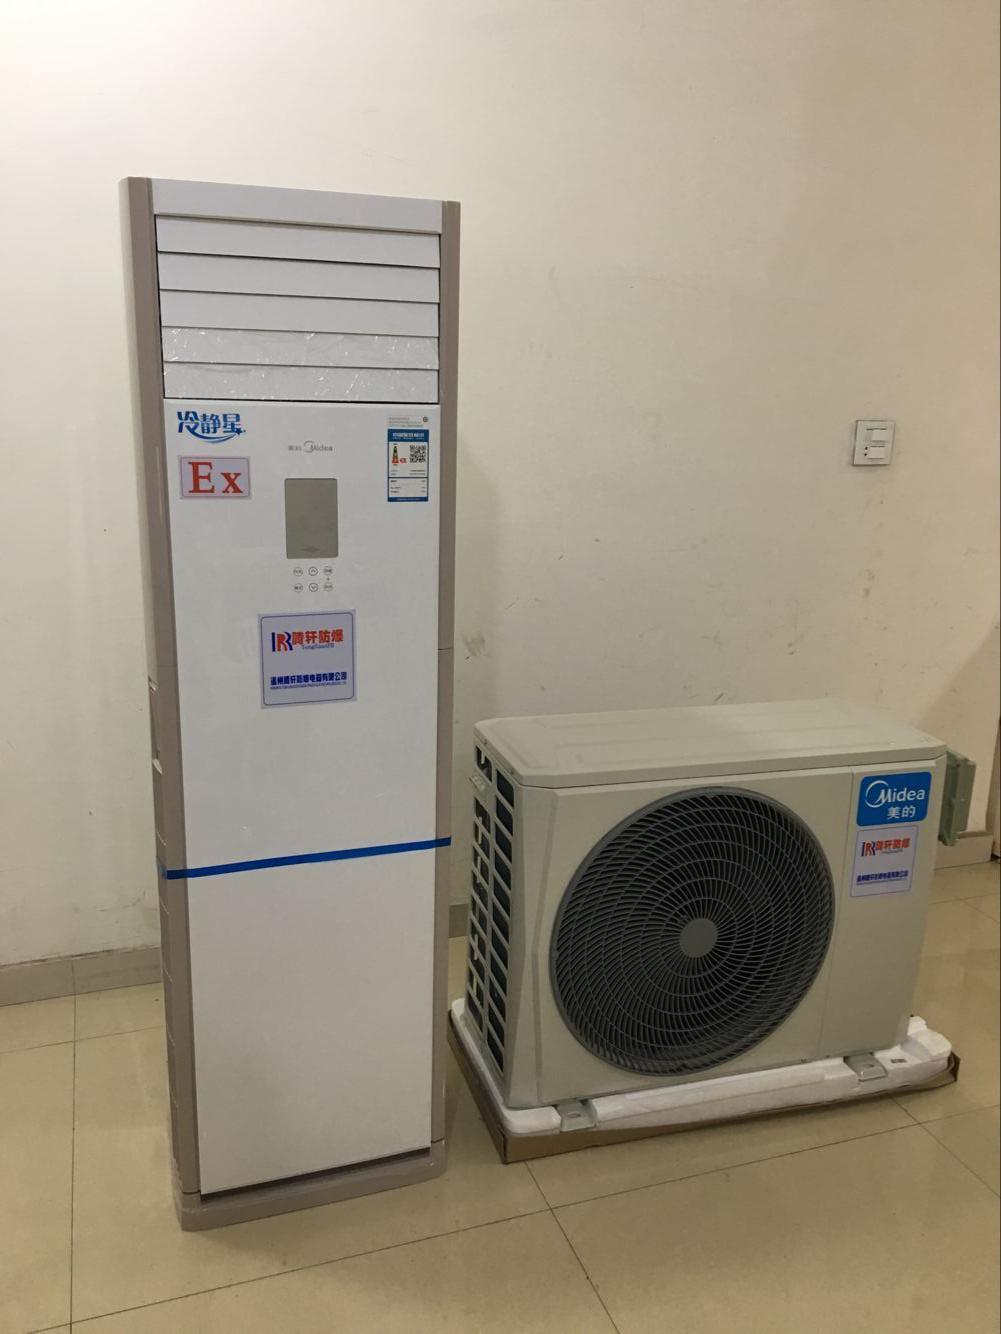 3p空调制热功率_格力空调3P是多大的功率-格力空调3P有多少种,电流是多少A,用 ...